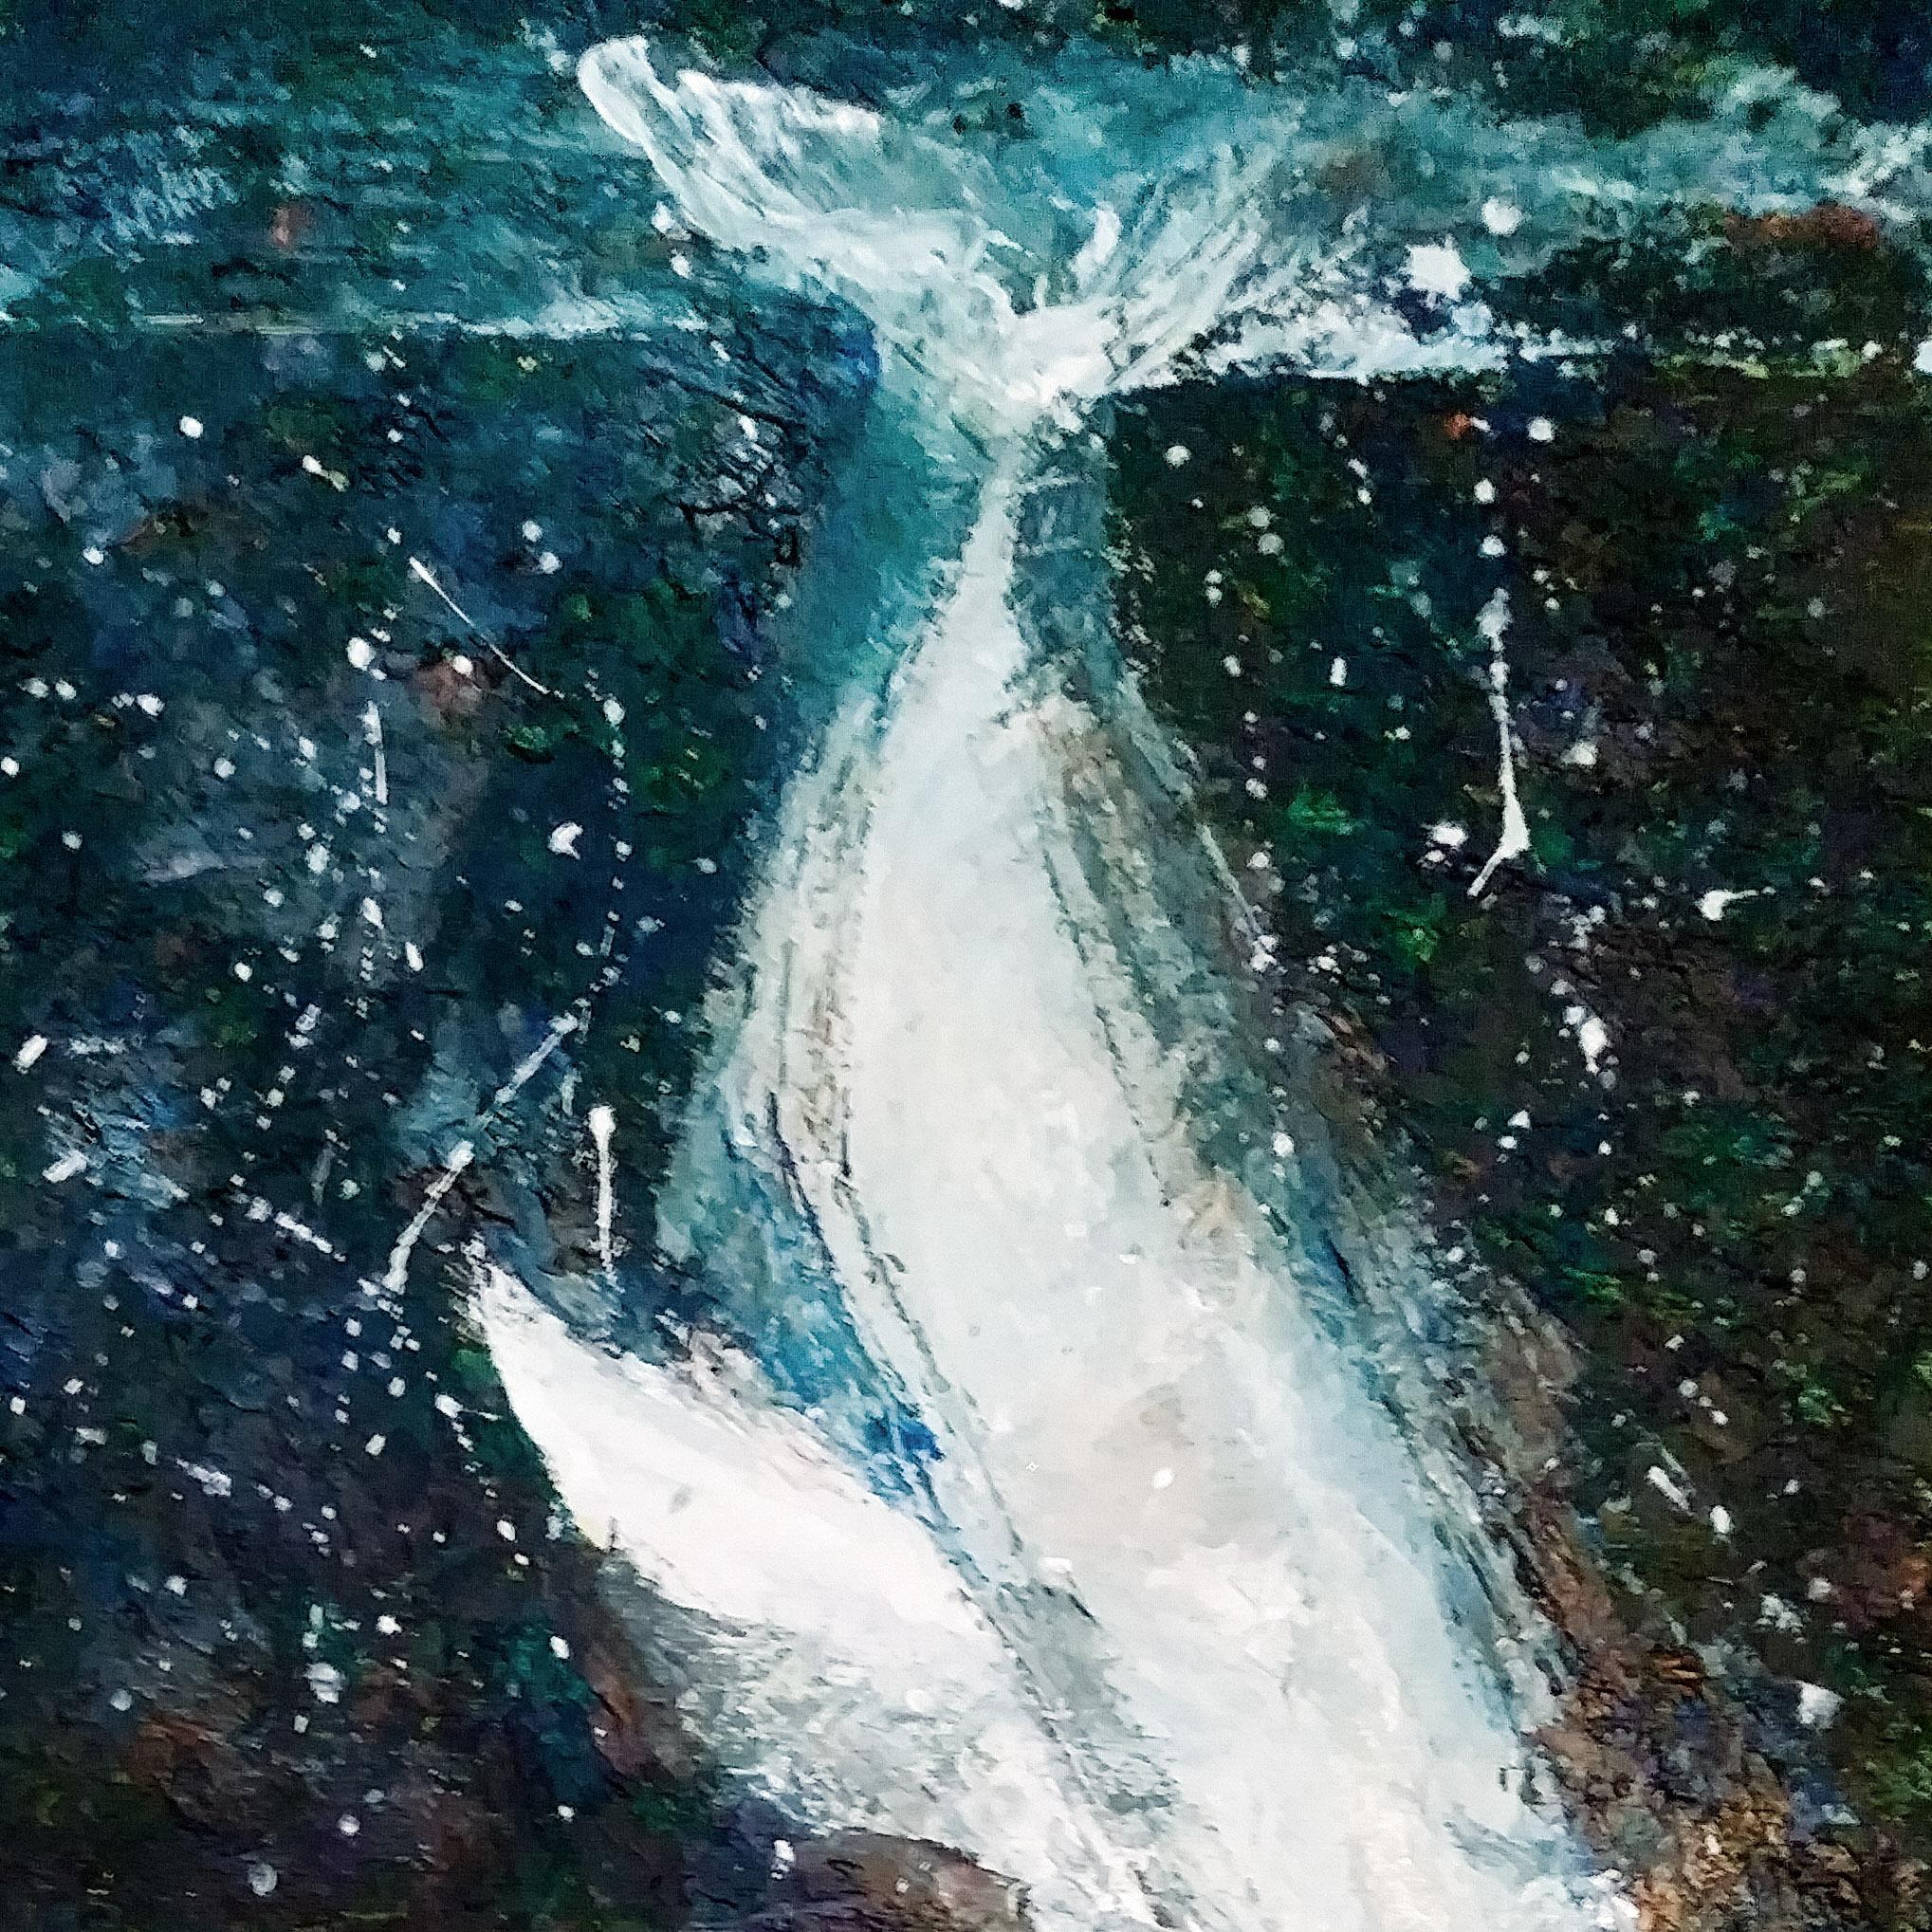 Whale Fall (2018)